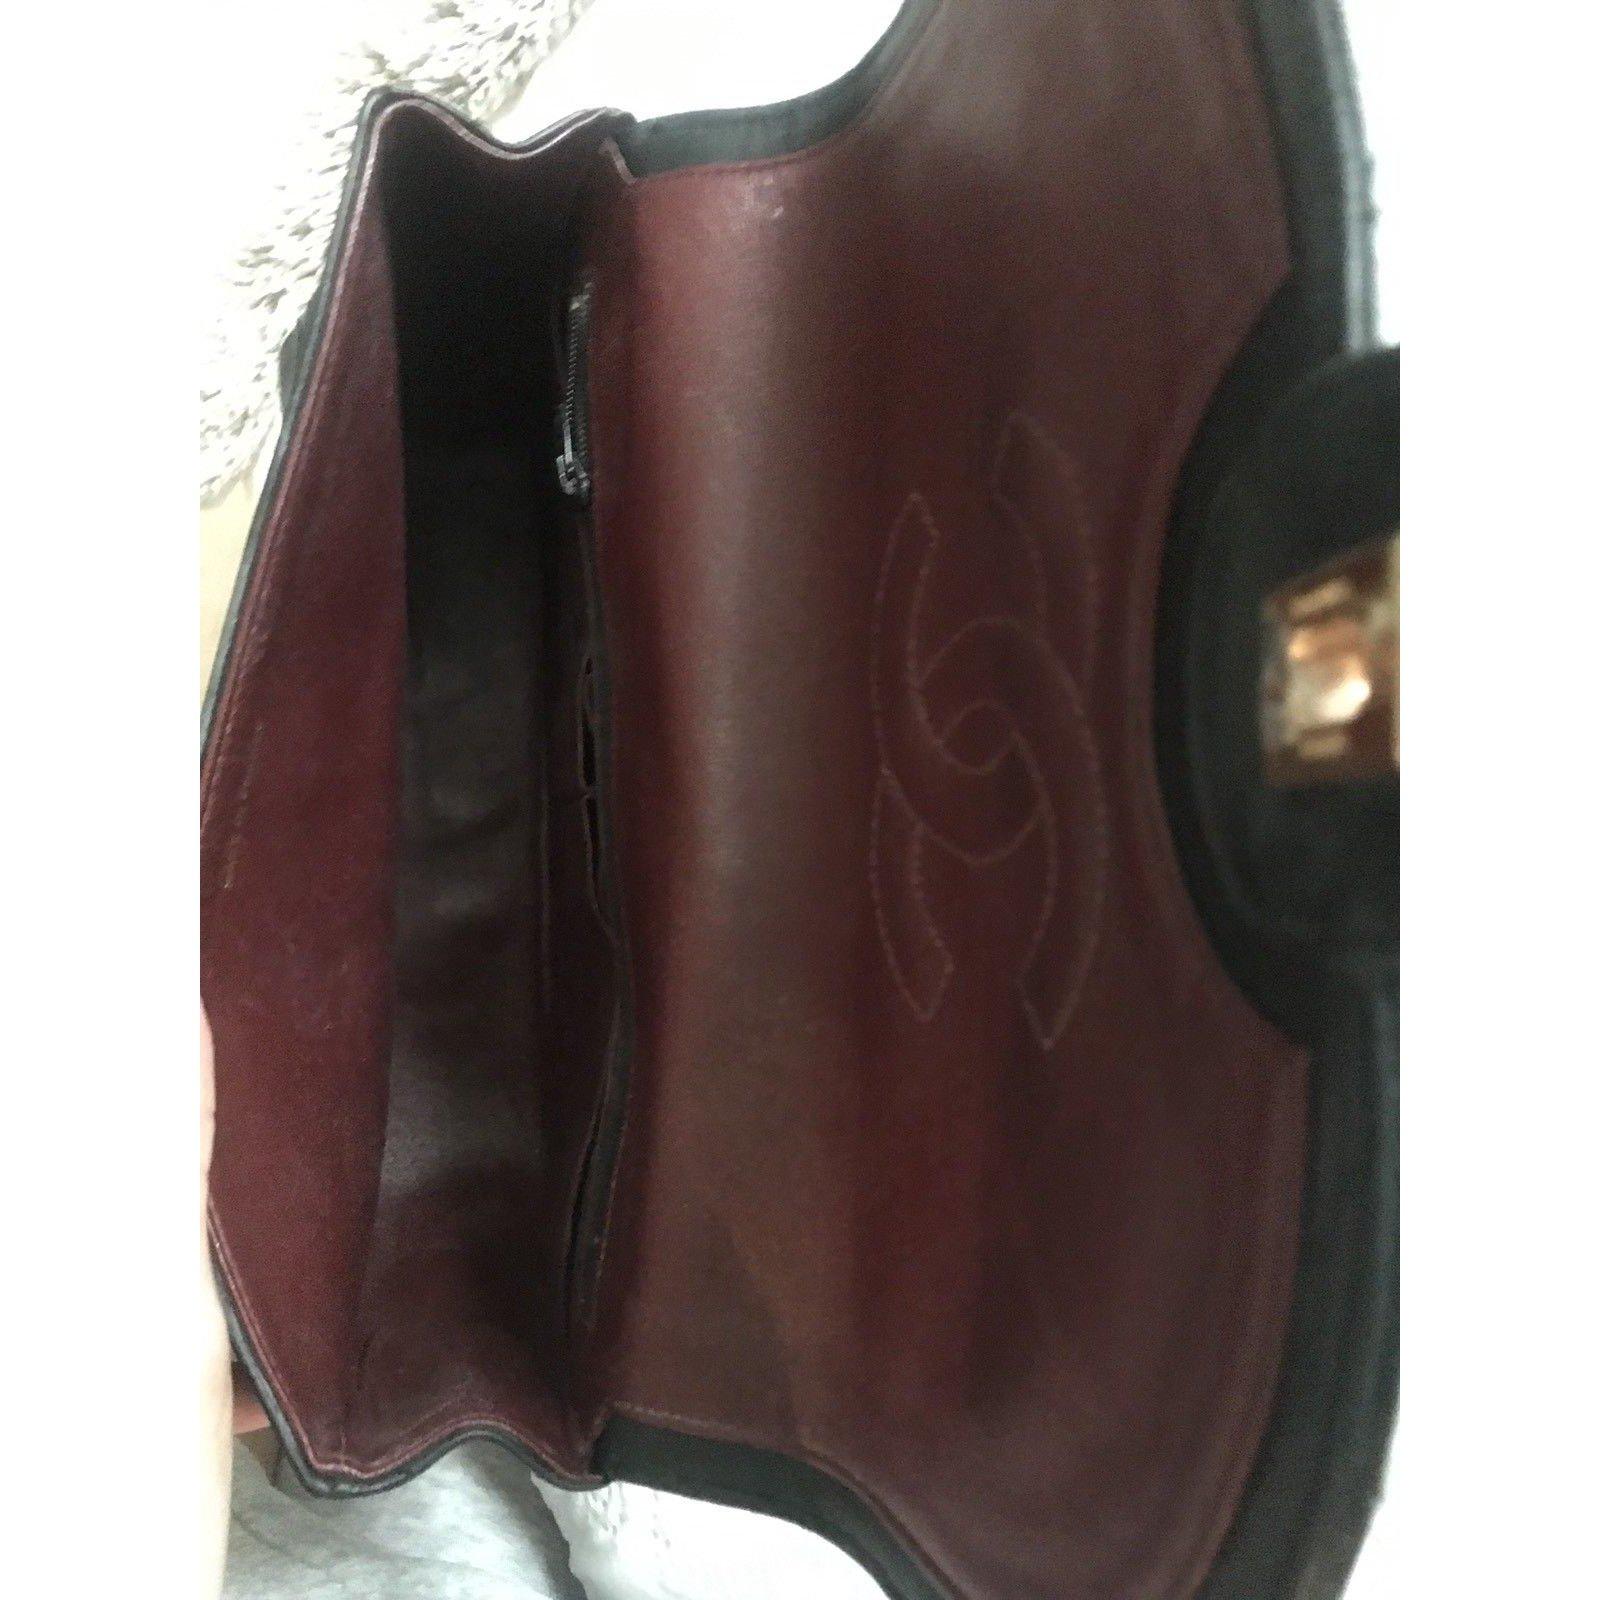 fc7c21213d28 Chanel TIMELESS Large Vintage Clutch Handbags Leather Black ref.101576 -  Joli Closet